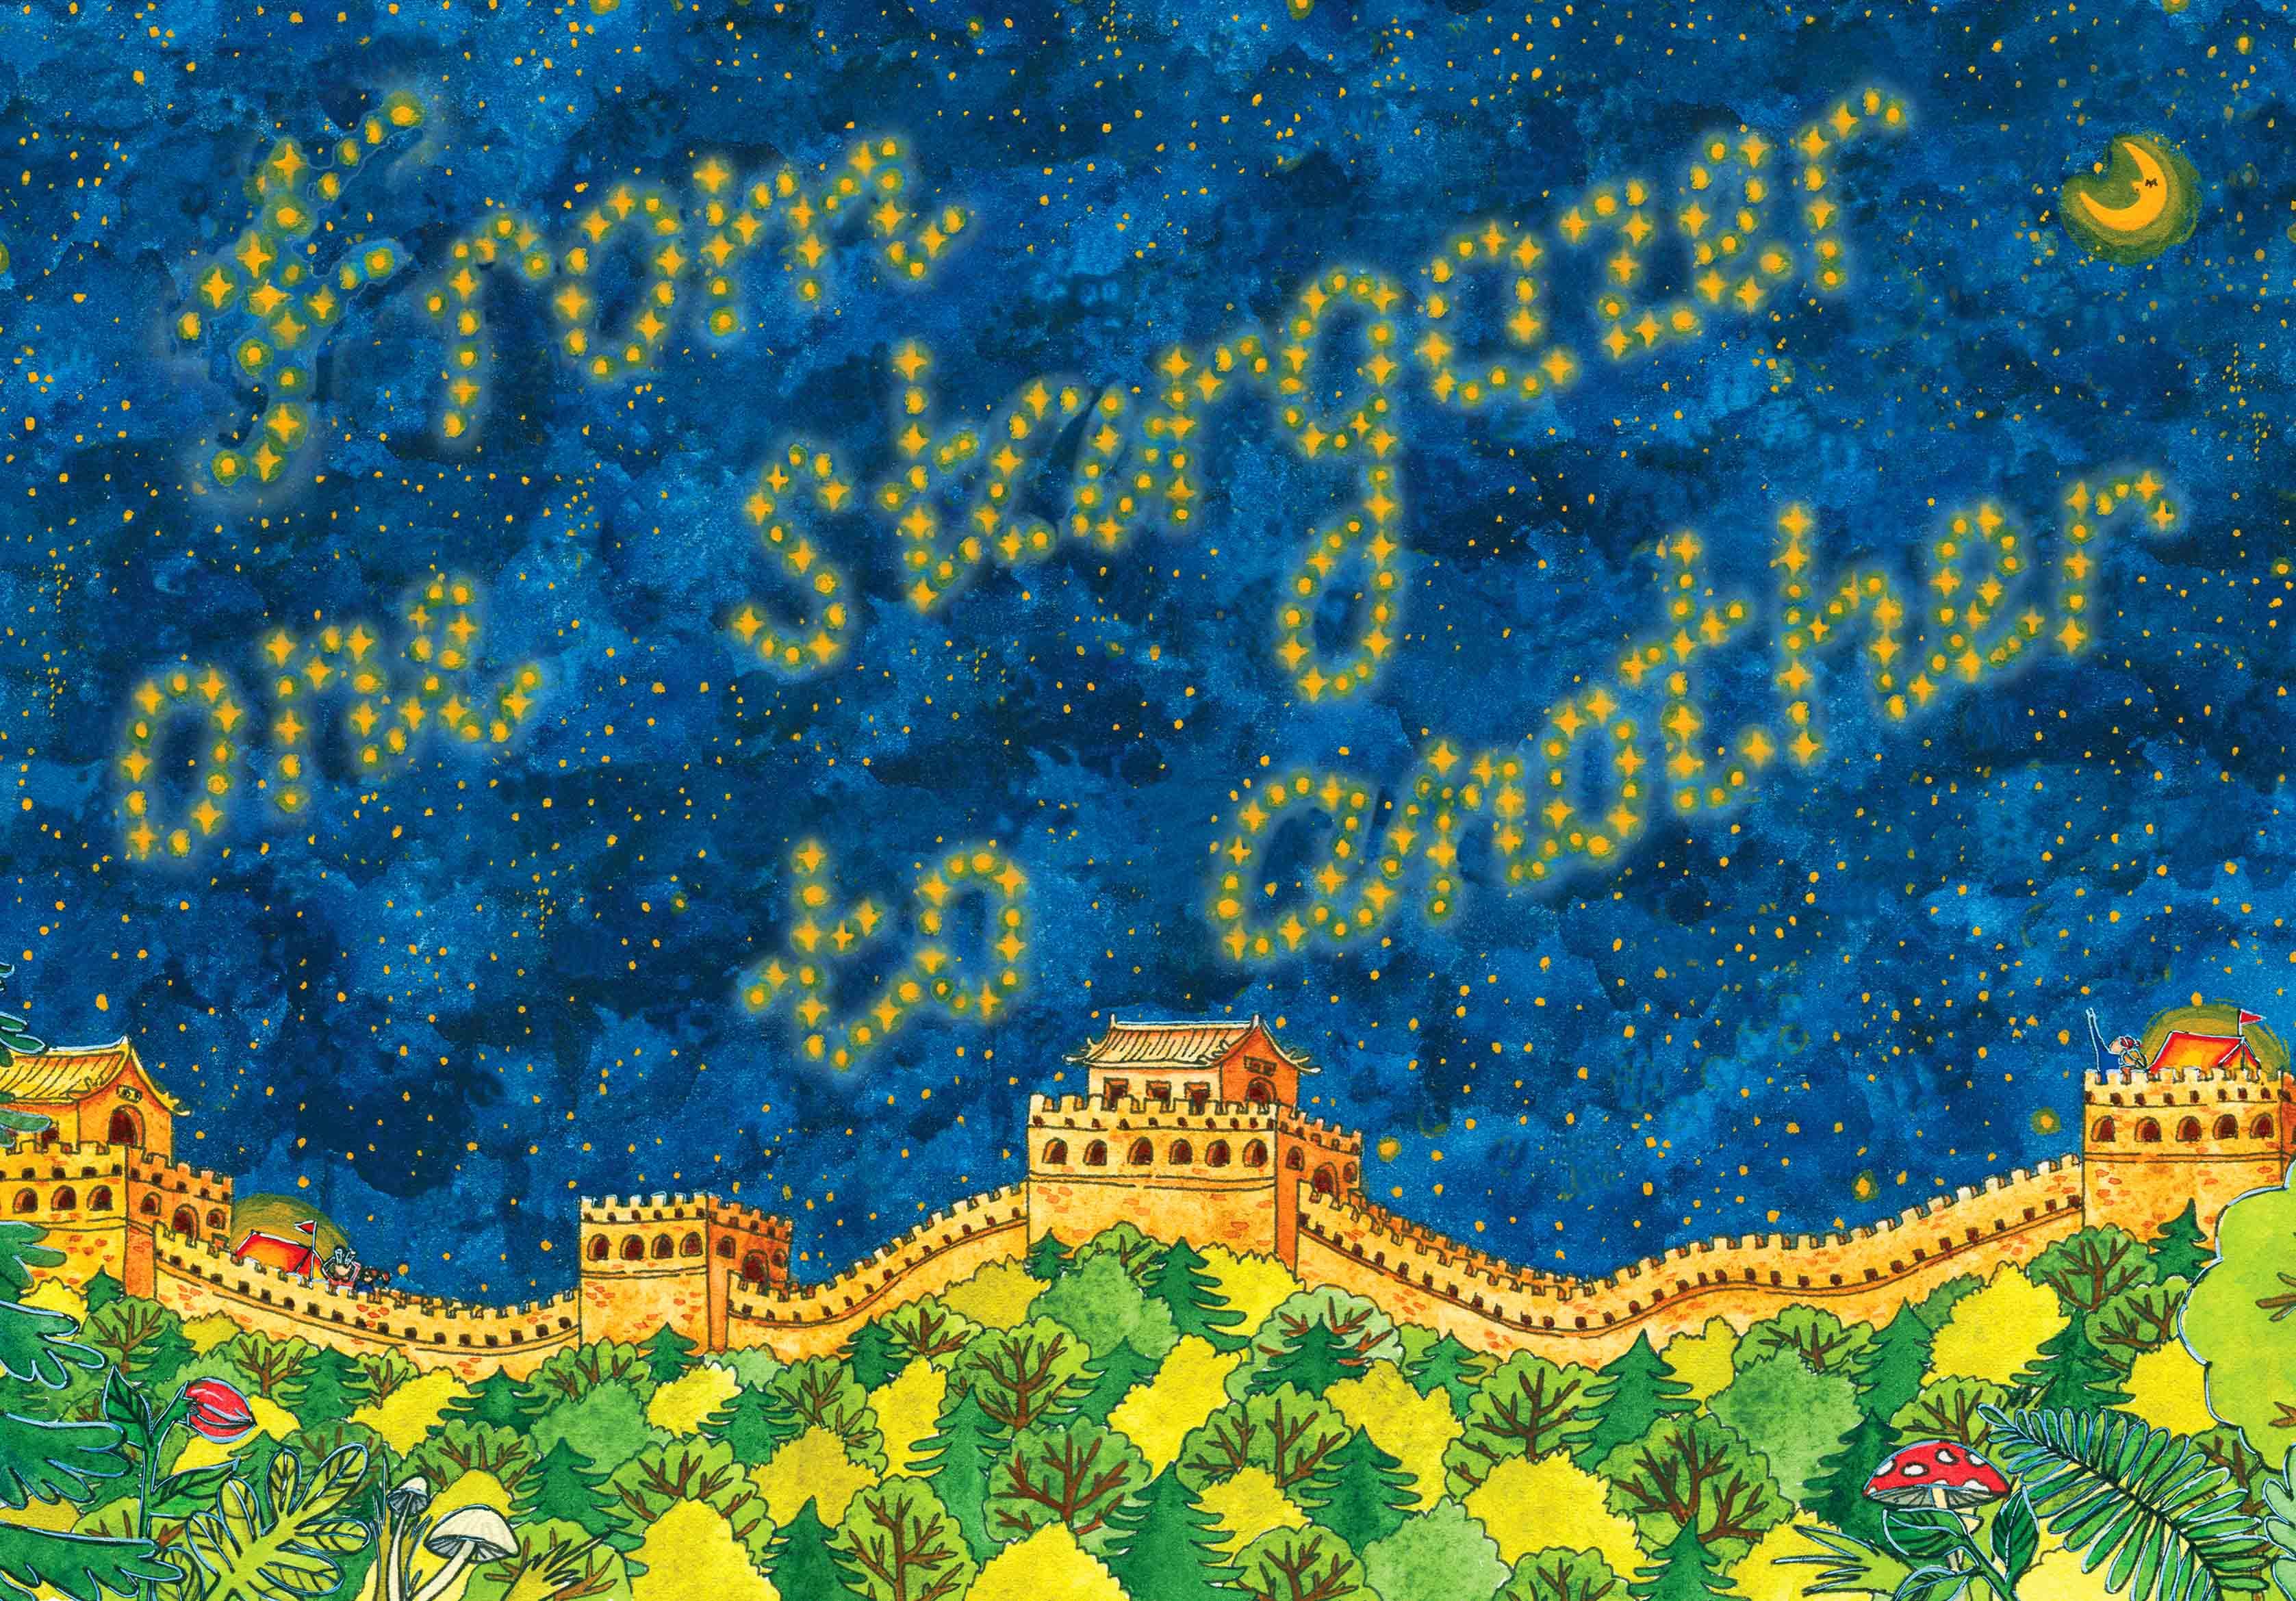 Postcard Illustration Liuba Draws